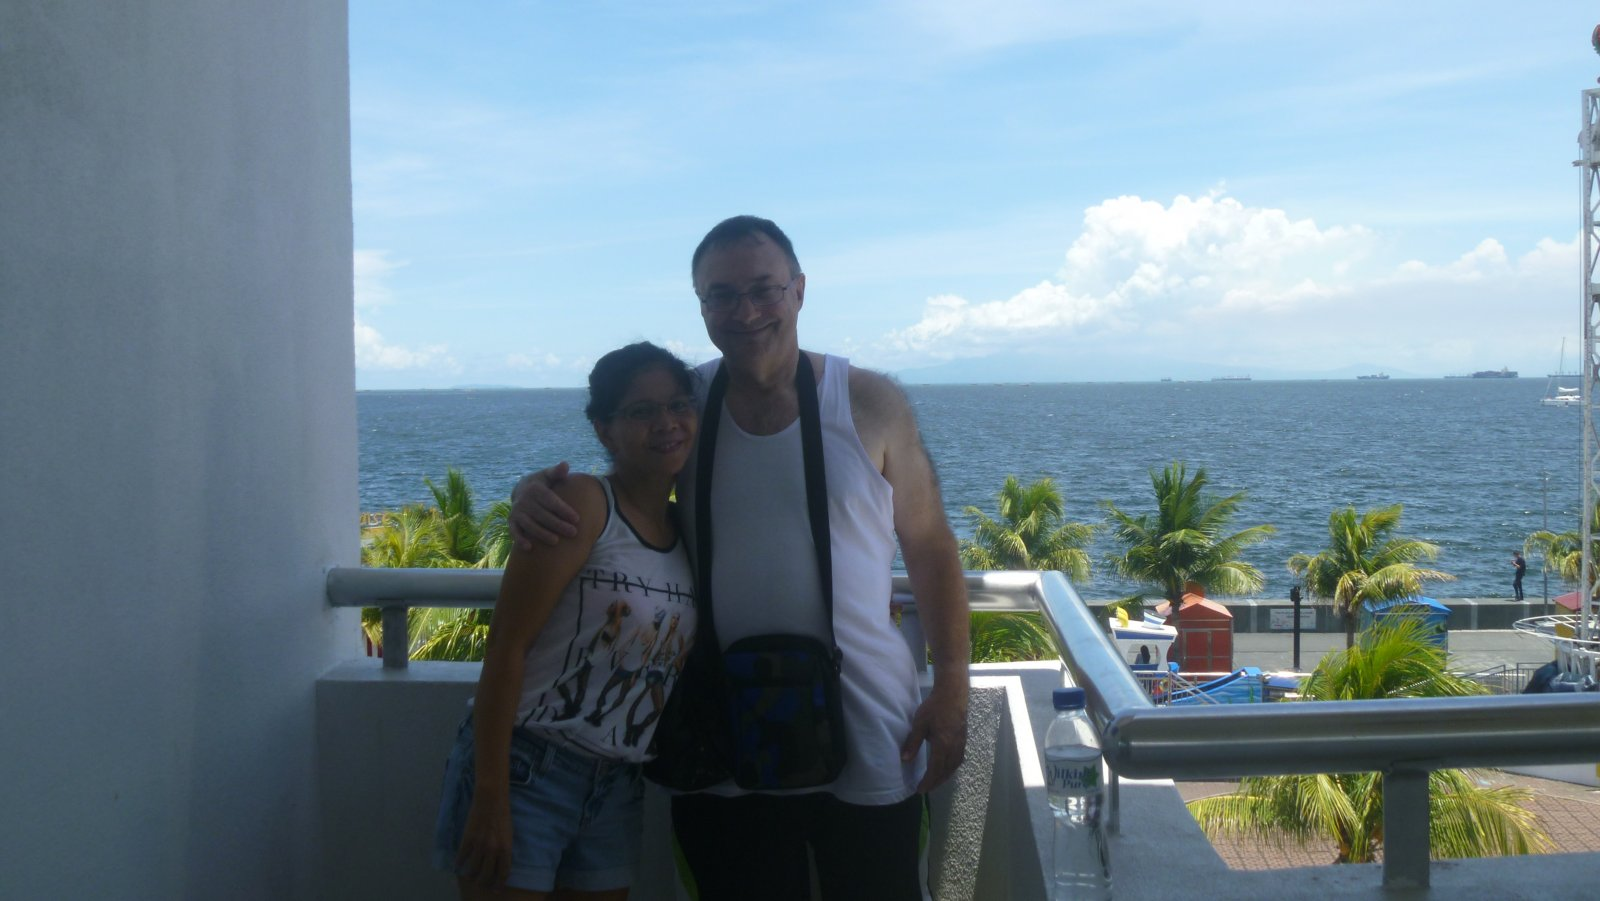 Roshell-and-David-at-the-Manila-Bay-overlook-at-Mall-Of-Asia, Manila